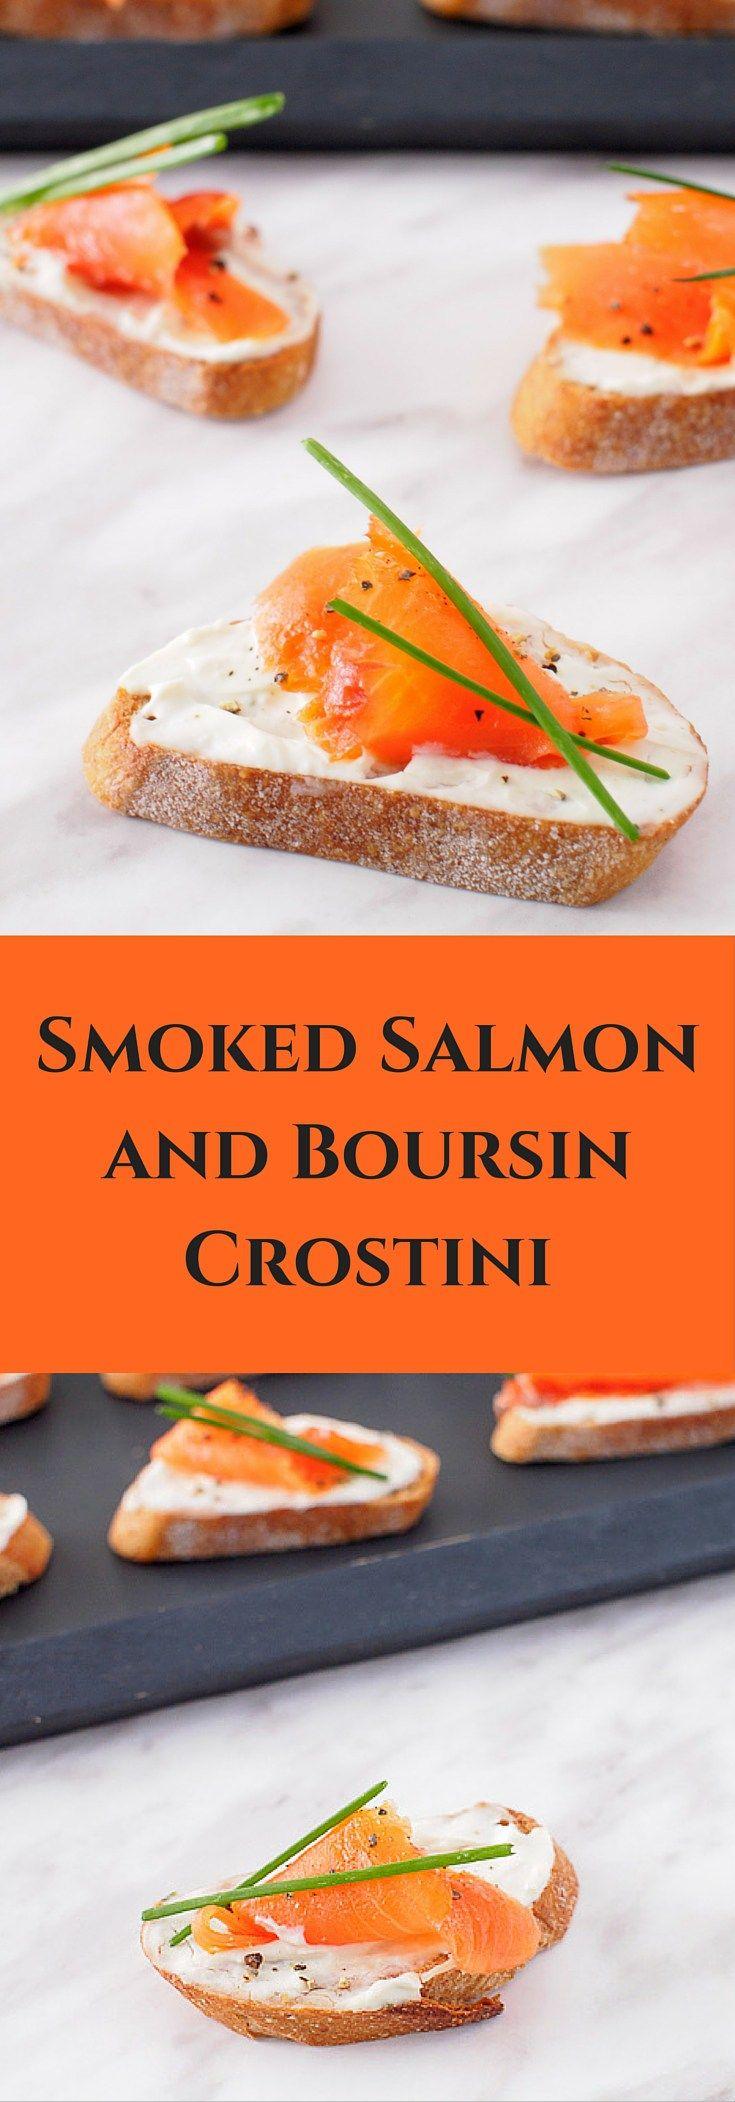 ... Dips & Bites on Pinterest | Cream cheeses, Smoked salmon and Stuffed